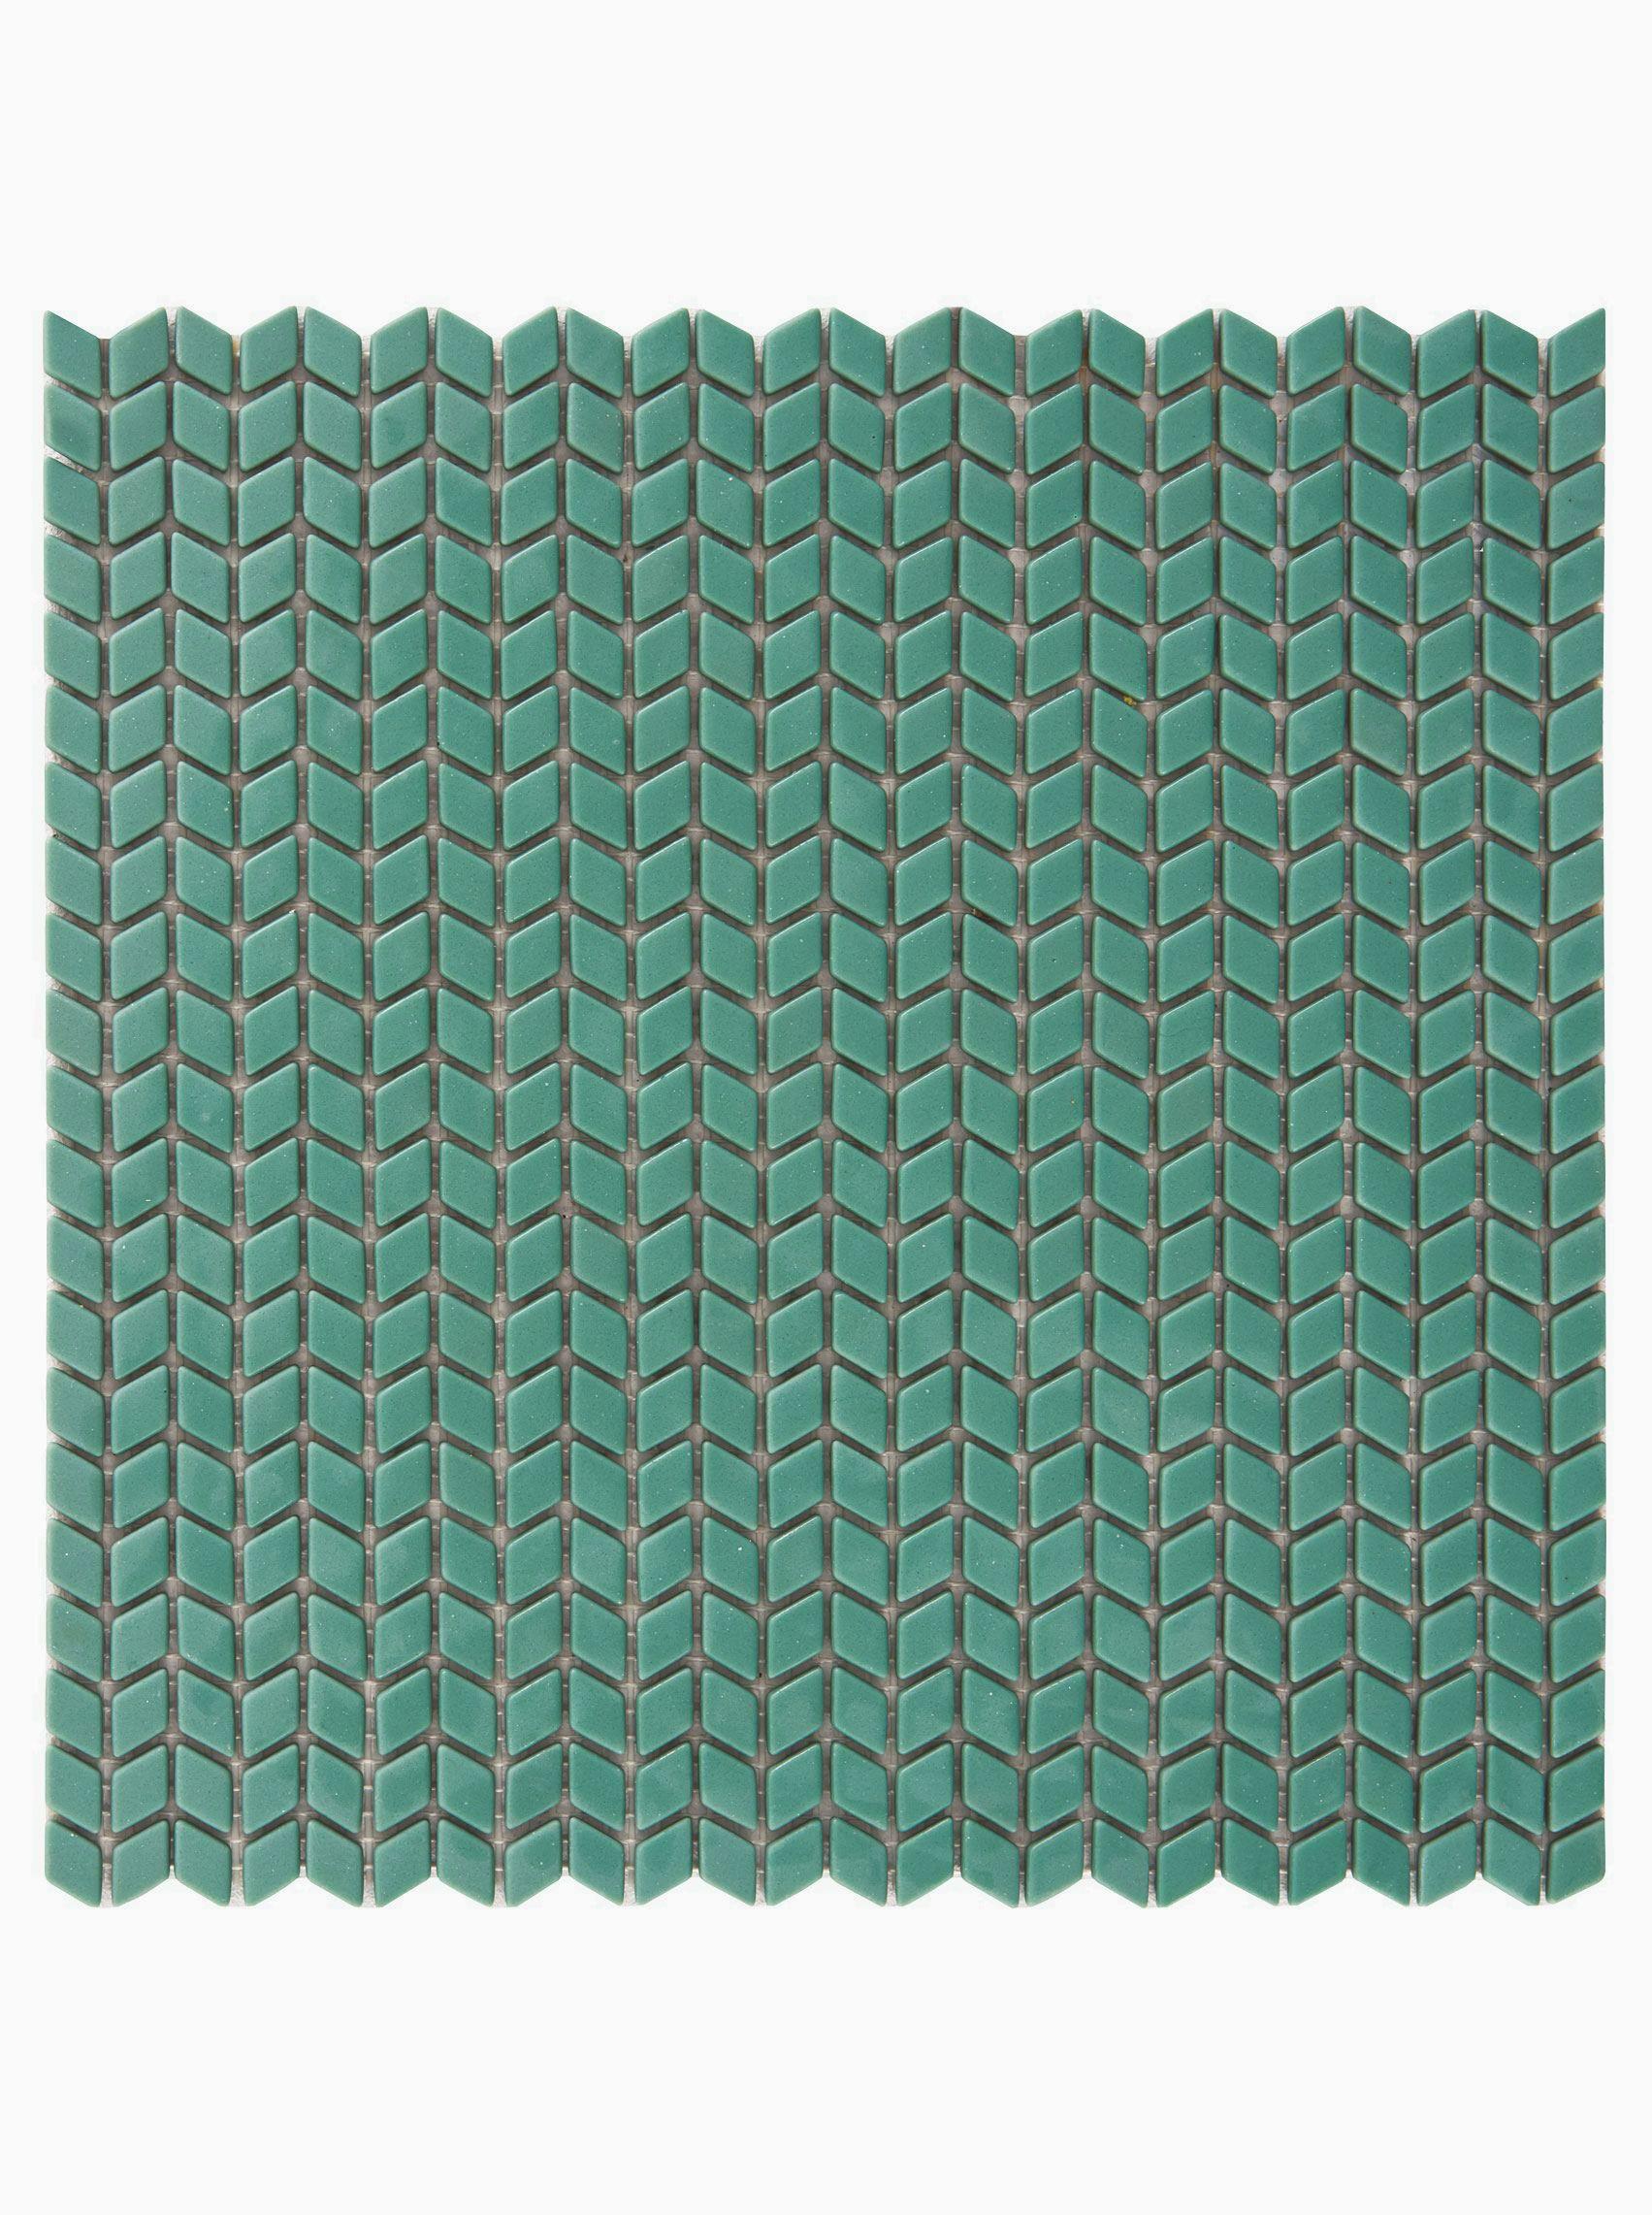 Confiserie Jade Chevron Mosaic